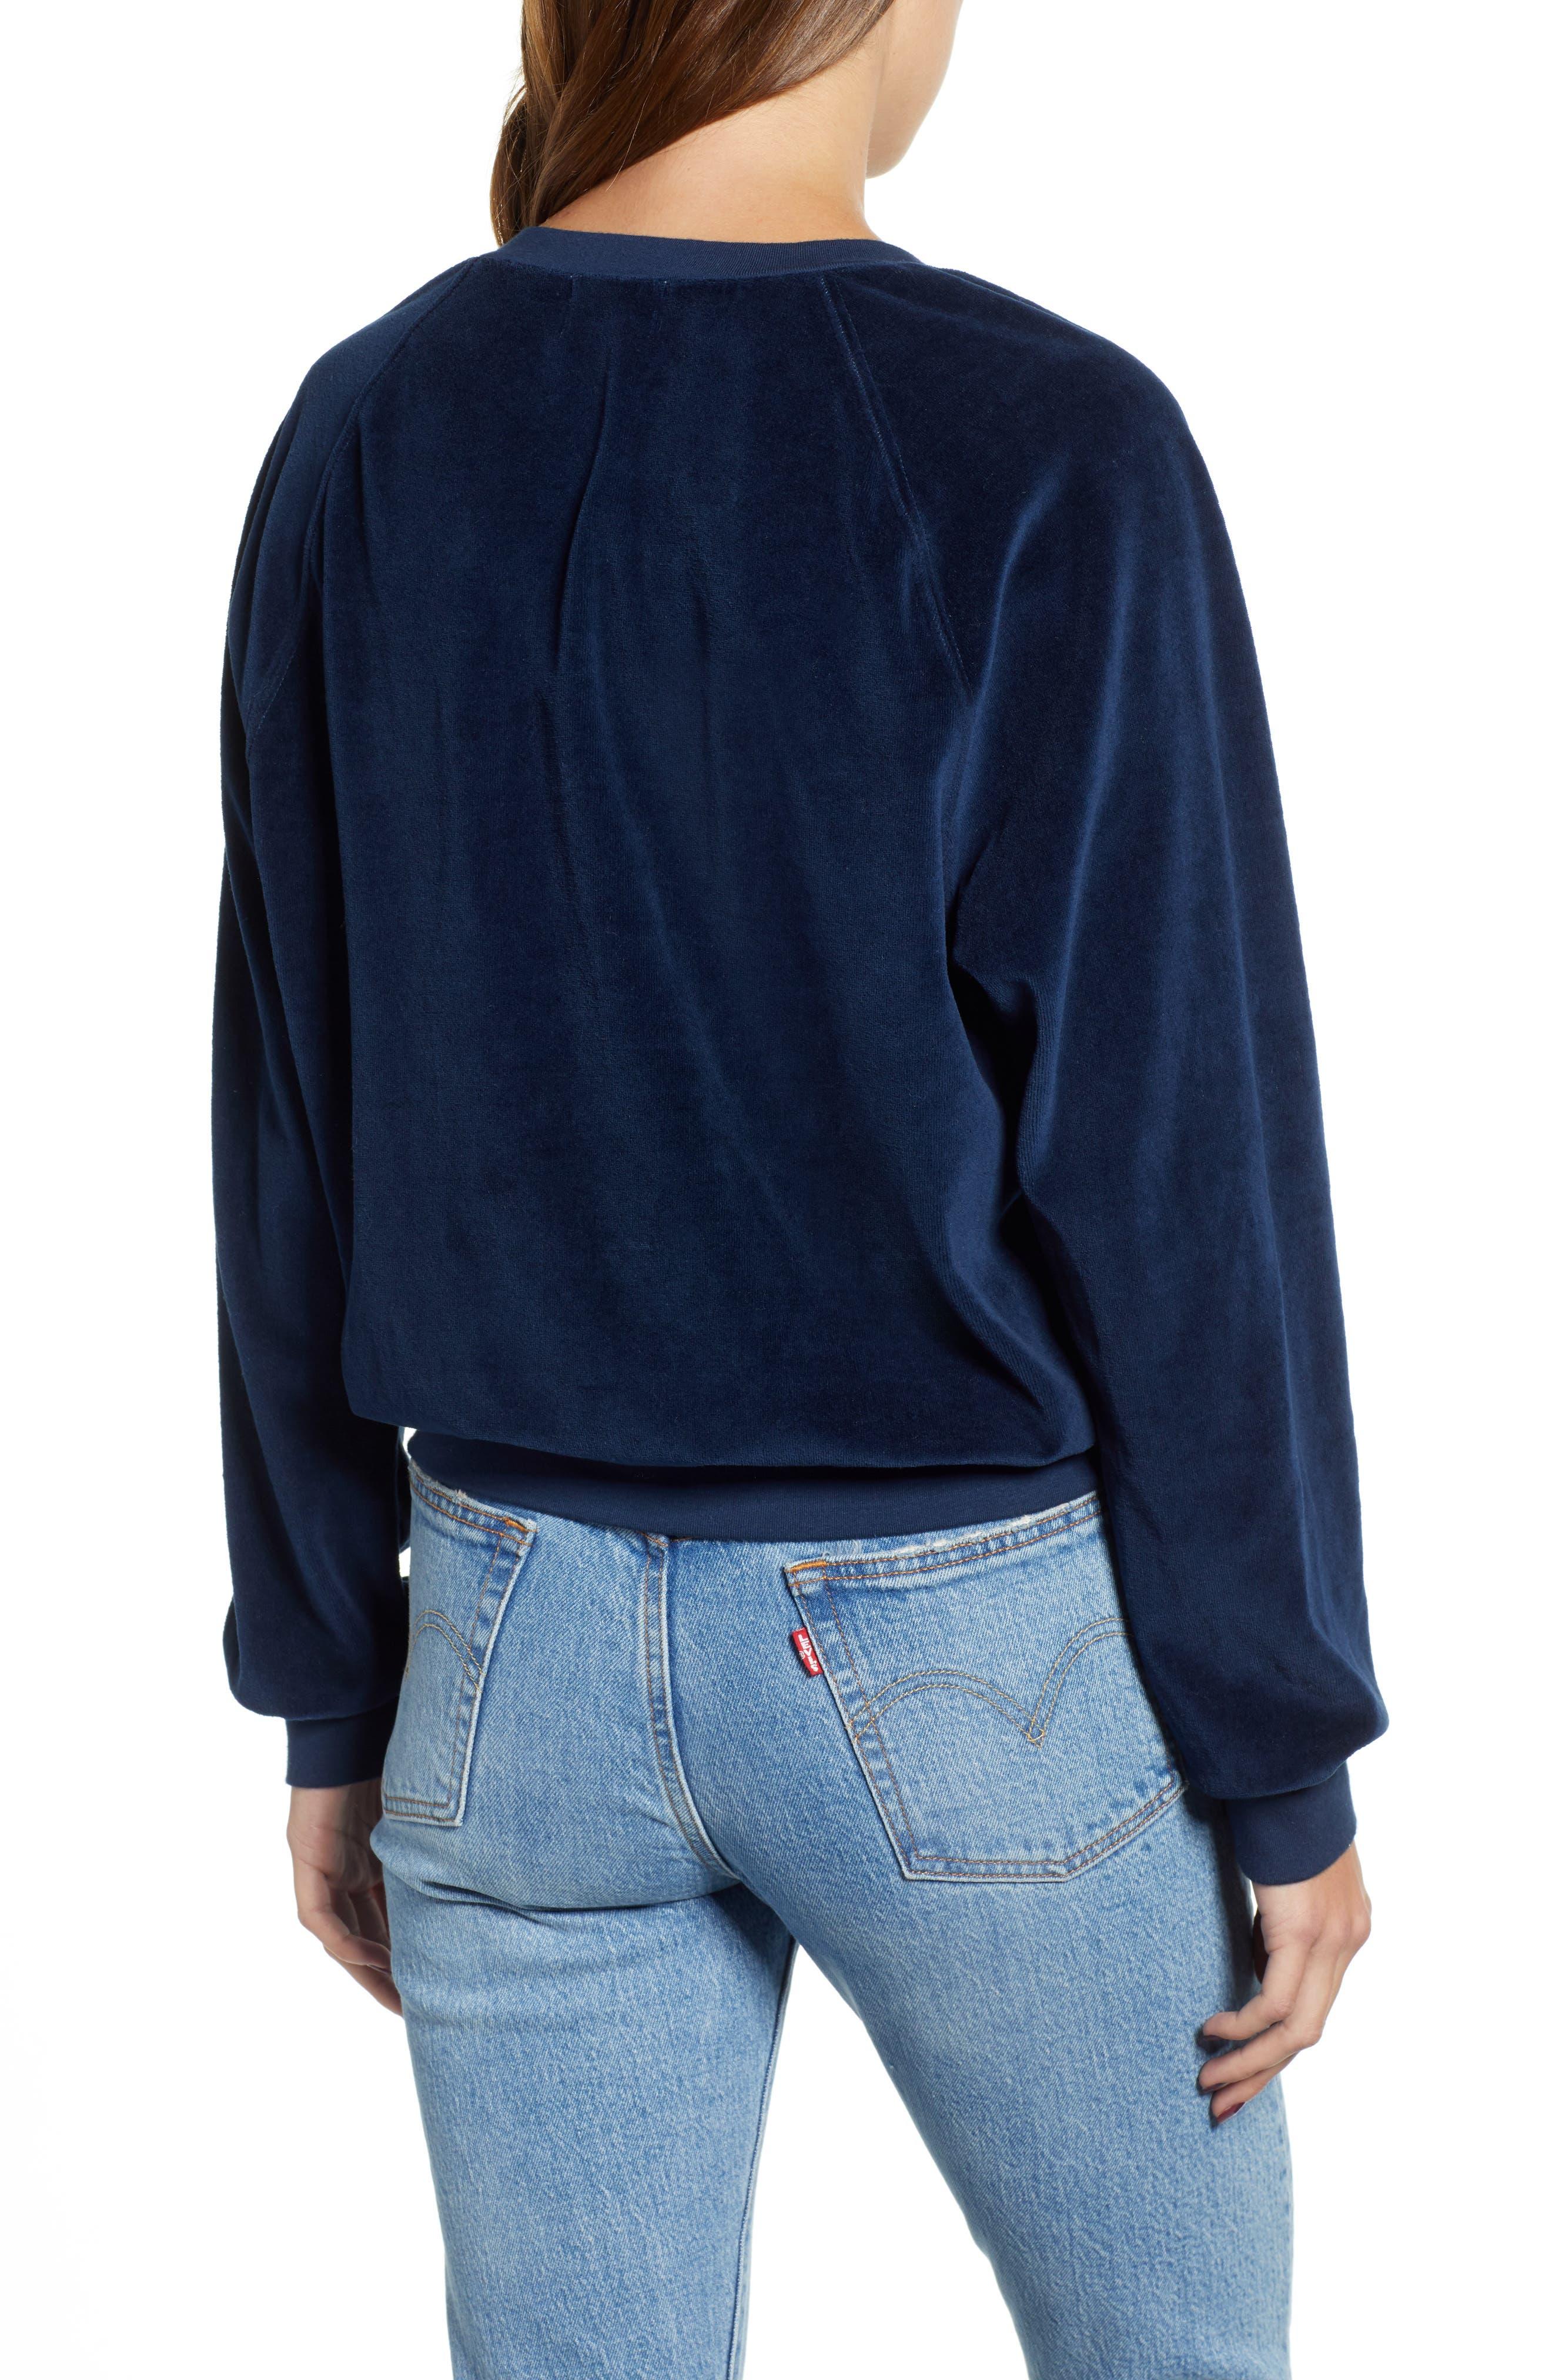 Velour Sweatshirt,                             Alternate thumbnail 2, color,                             NAVY